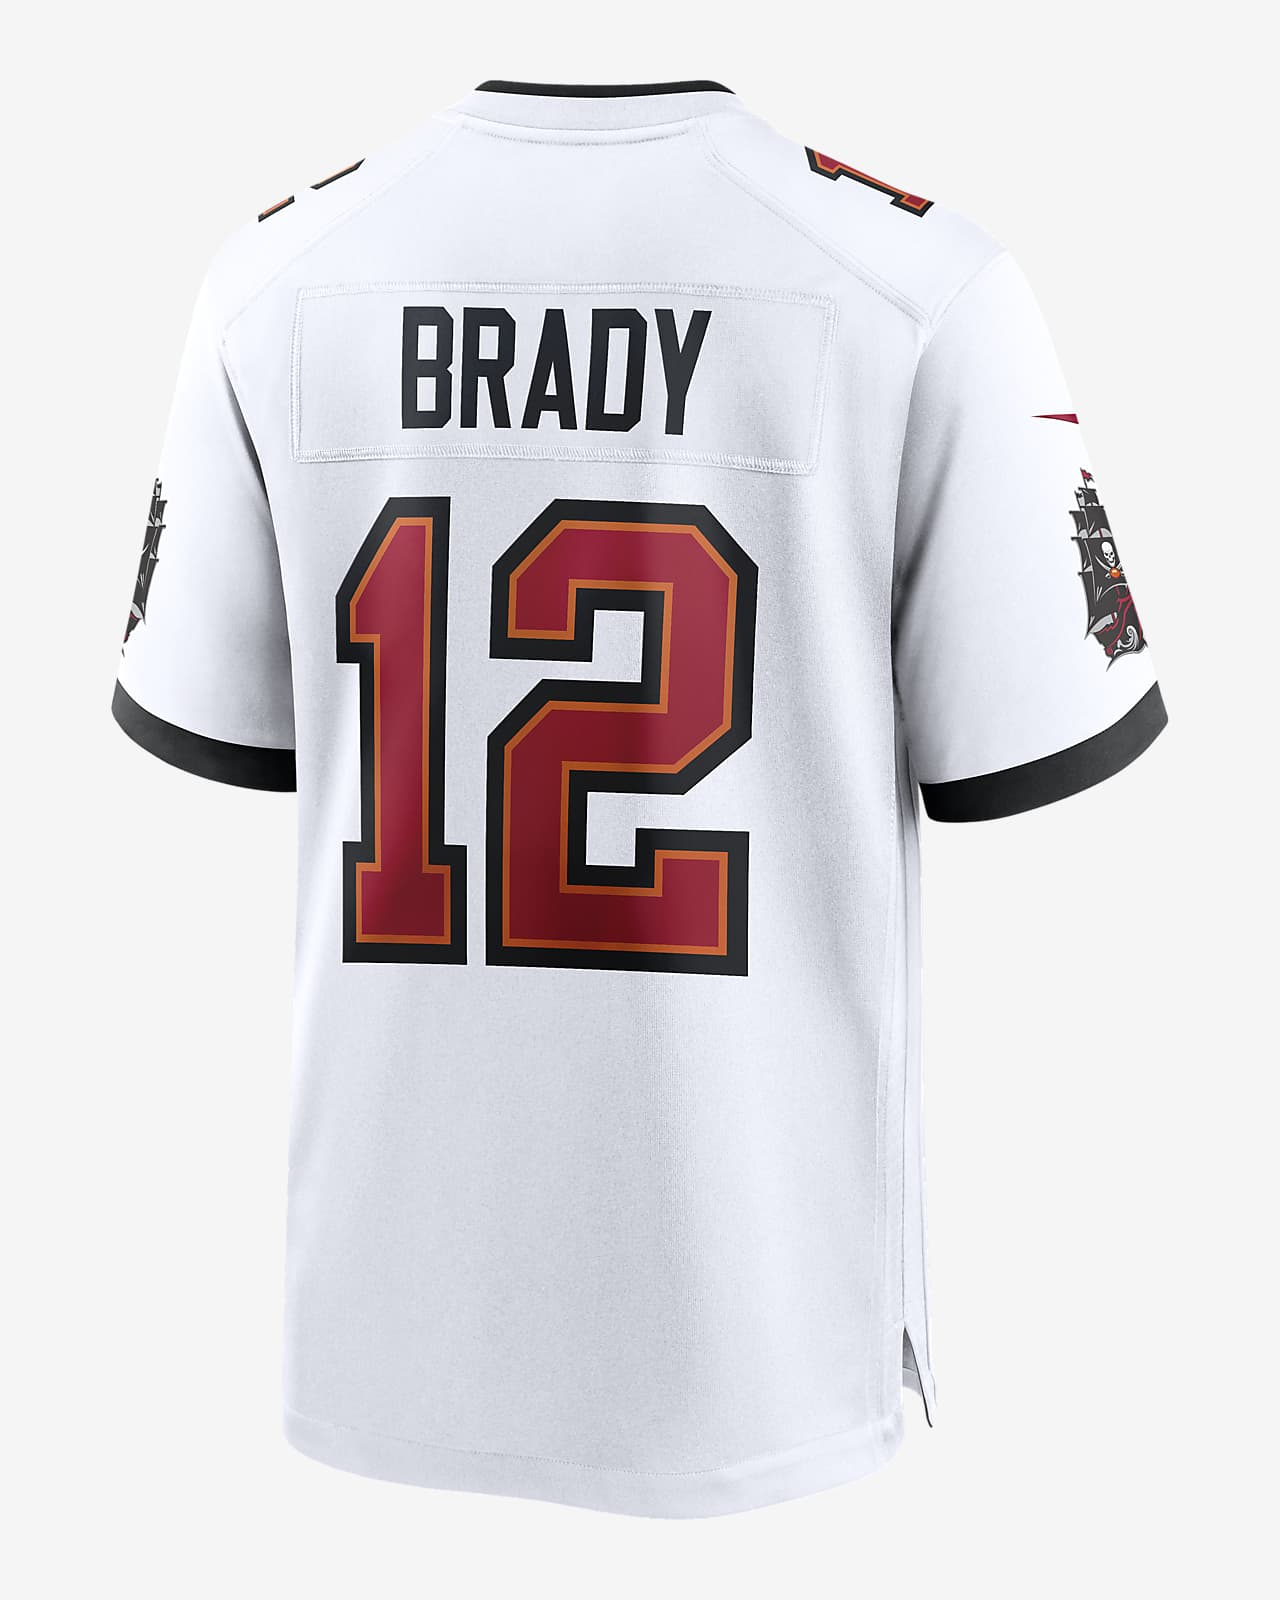 Peladura fuente visual  NFL Tampa Bay Buccaneers (Tom Brady) Men's Game Jersey. Nike.com